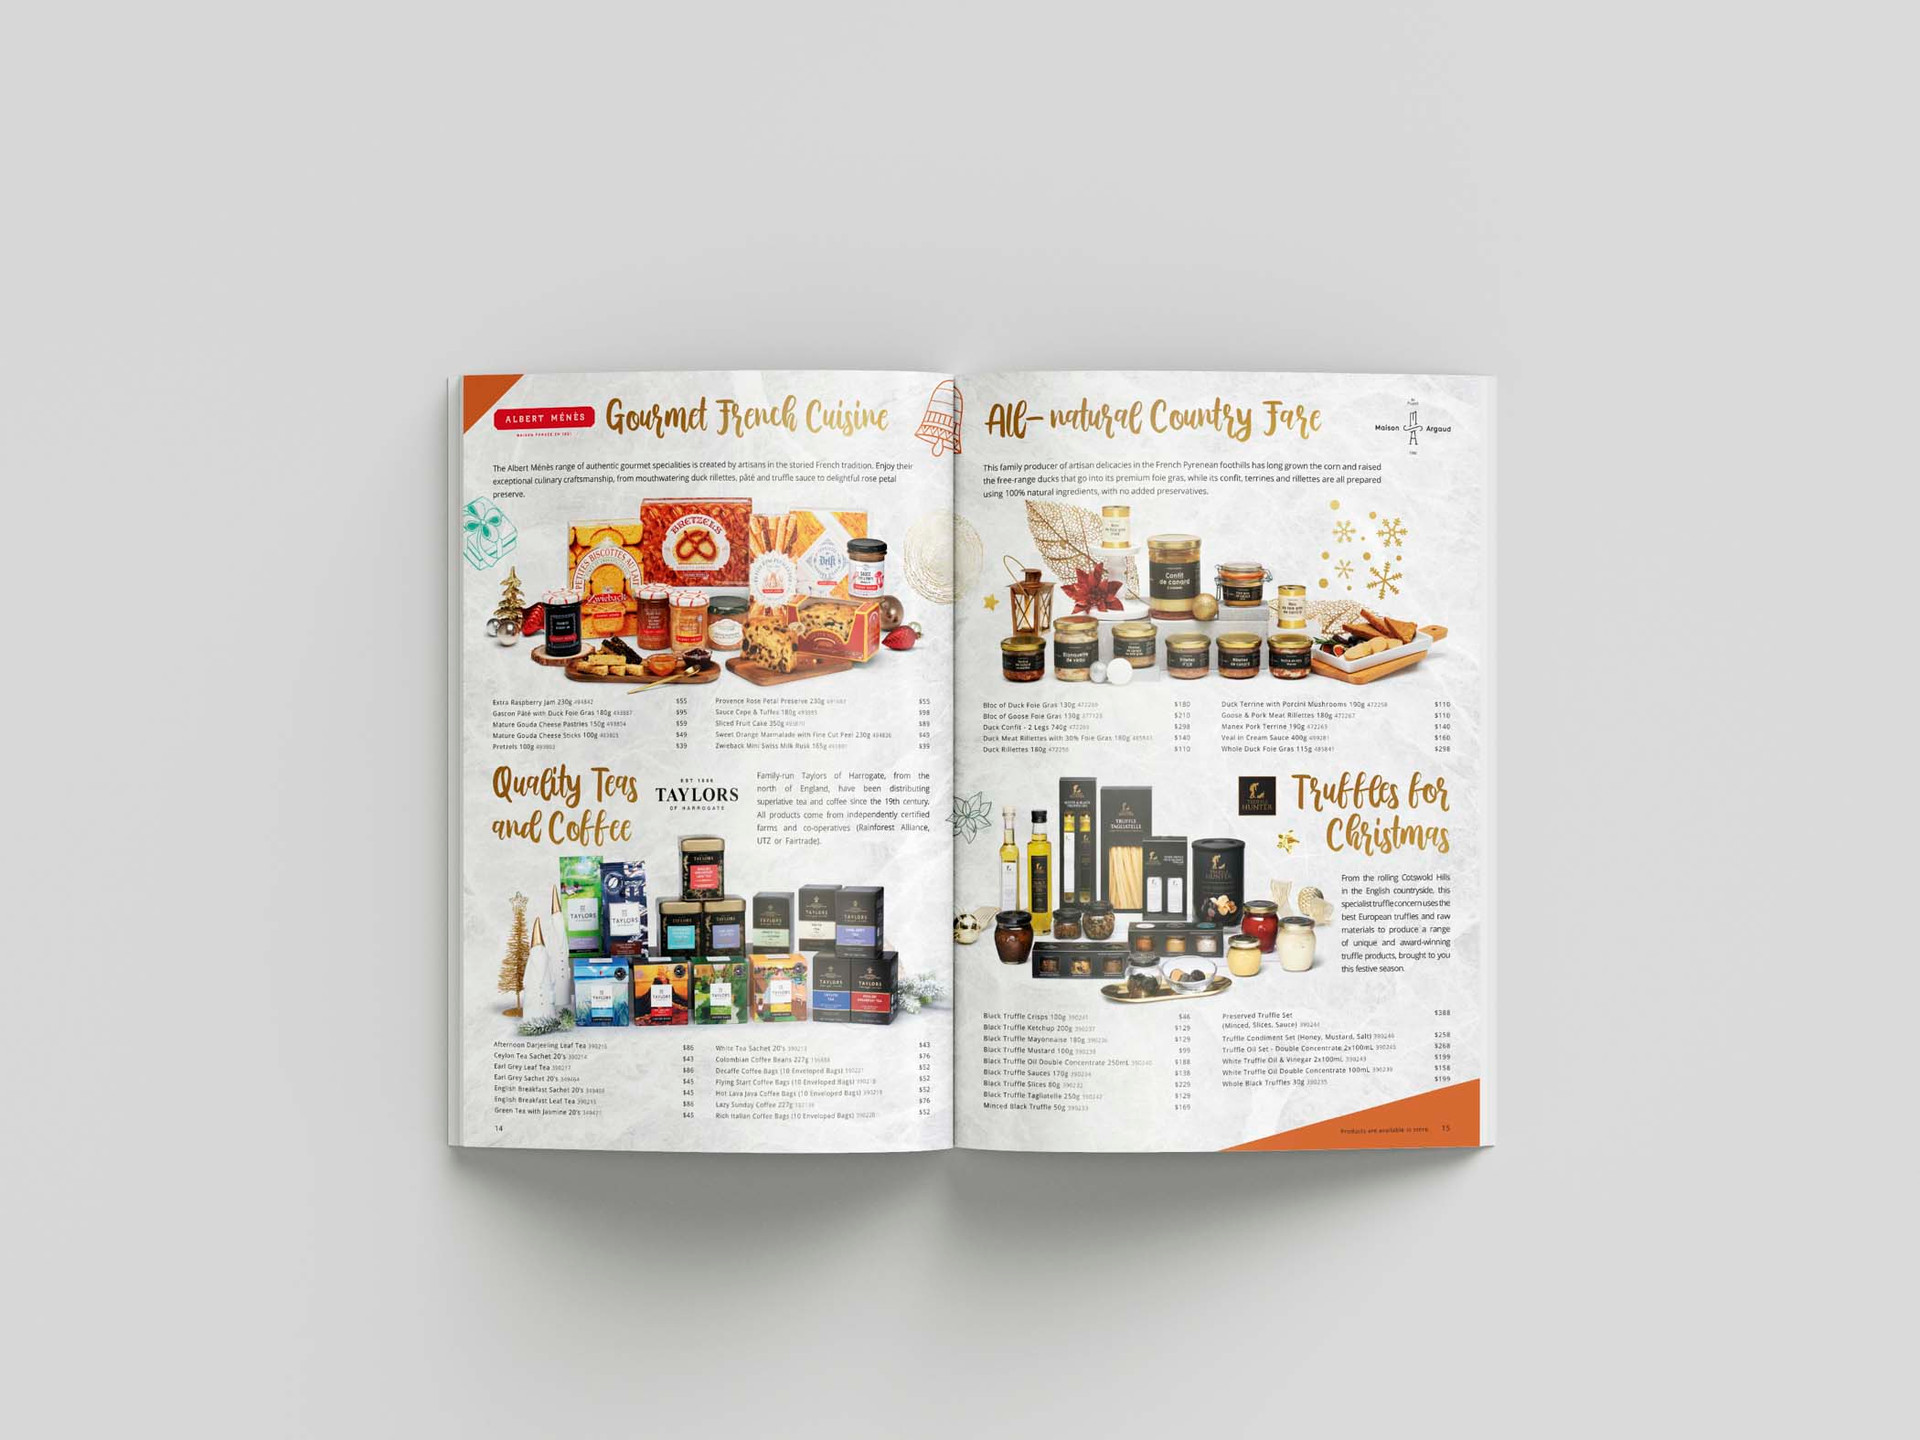 Great-Food-Hall-Catalogue-P.14-15s.jpg